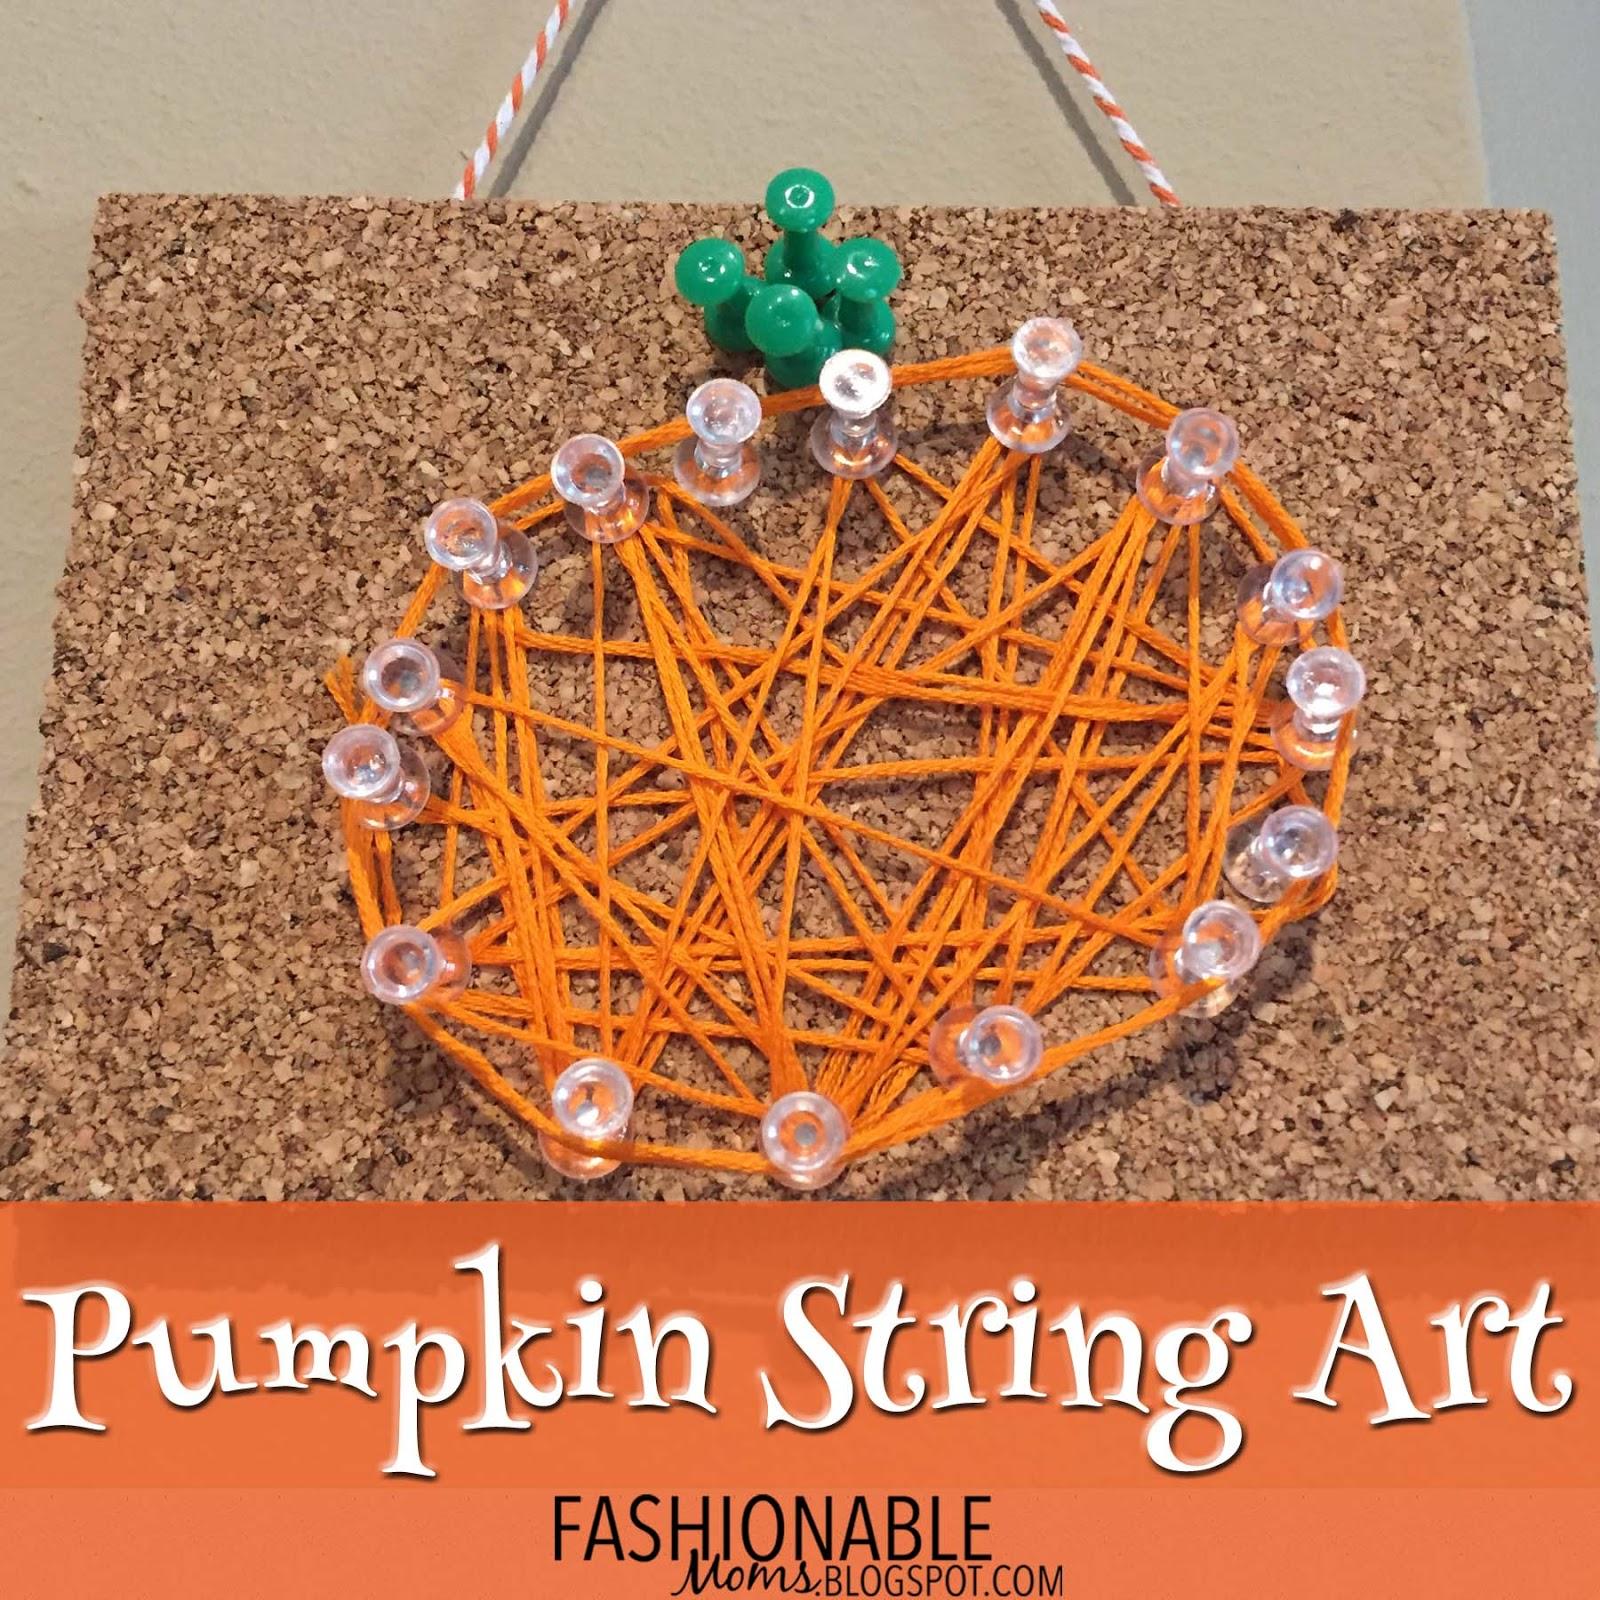 My Fashionable Designs: Pumpkin String Art With Push Pins